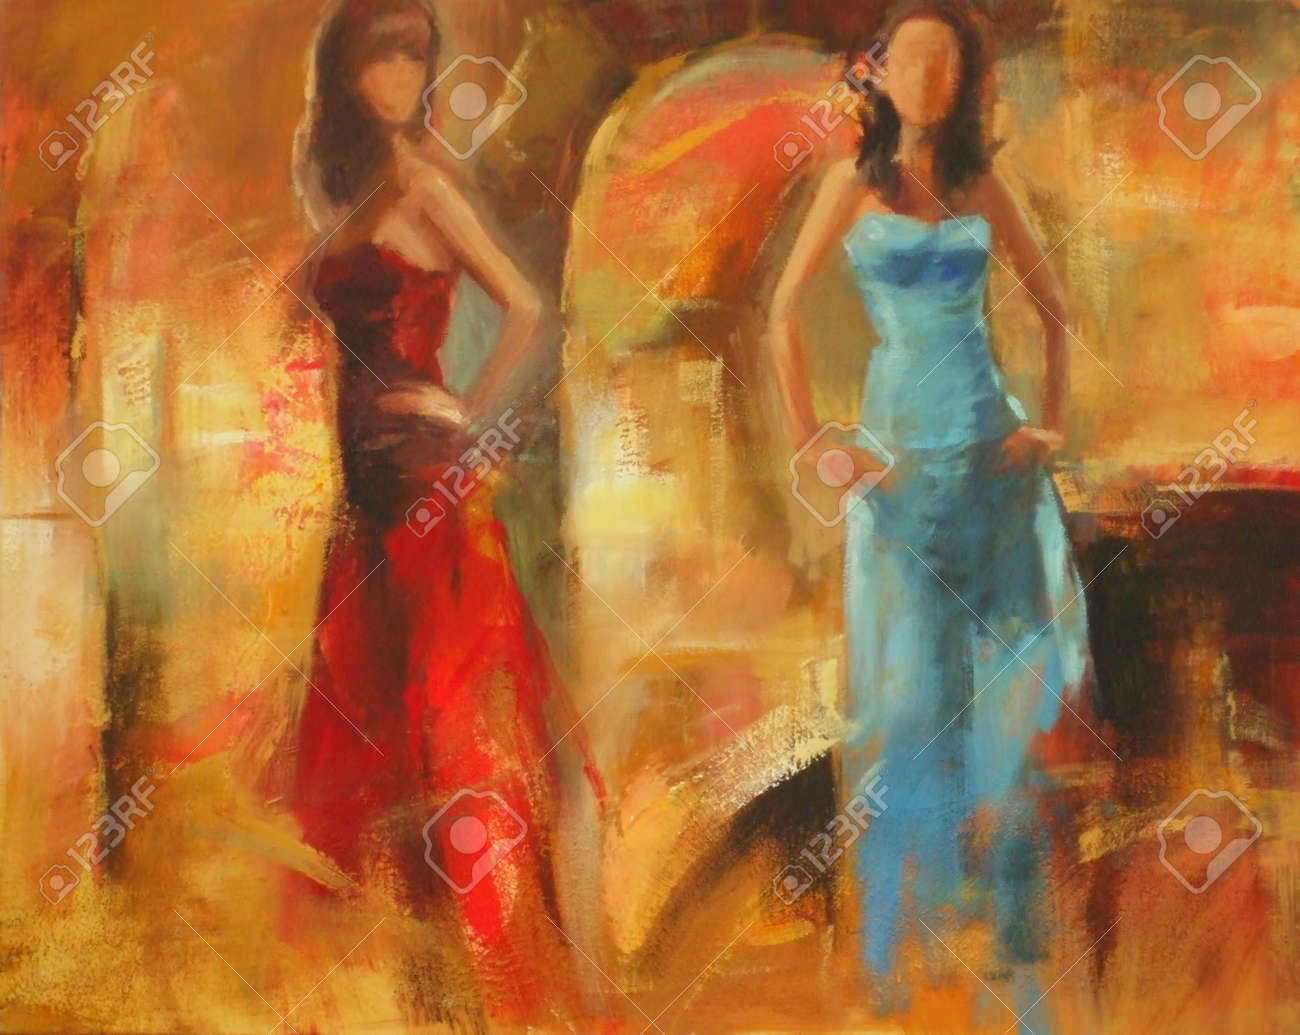 Female Figures Handmade Oil Painting Stock Photo